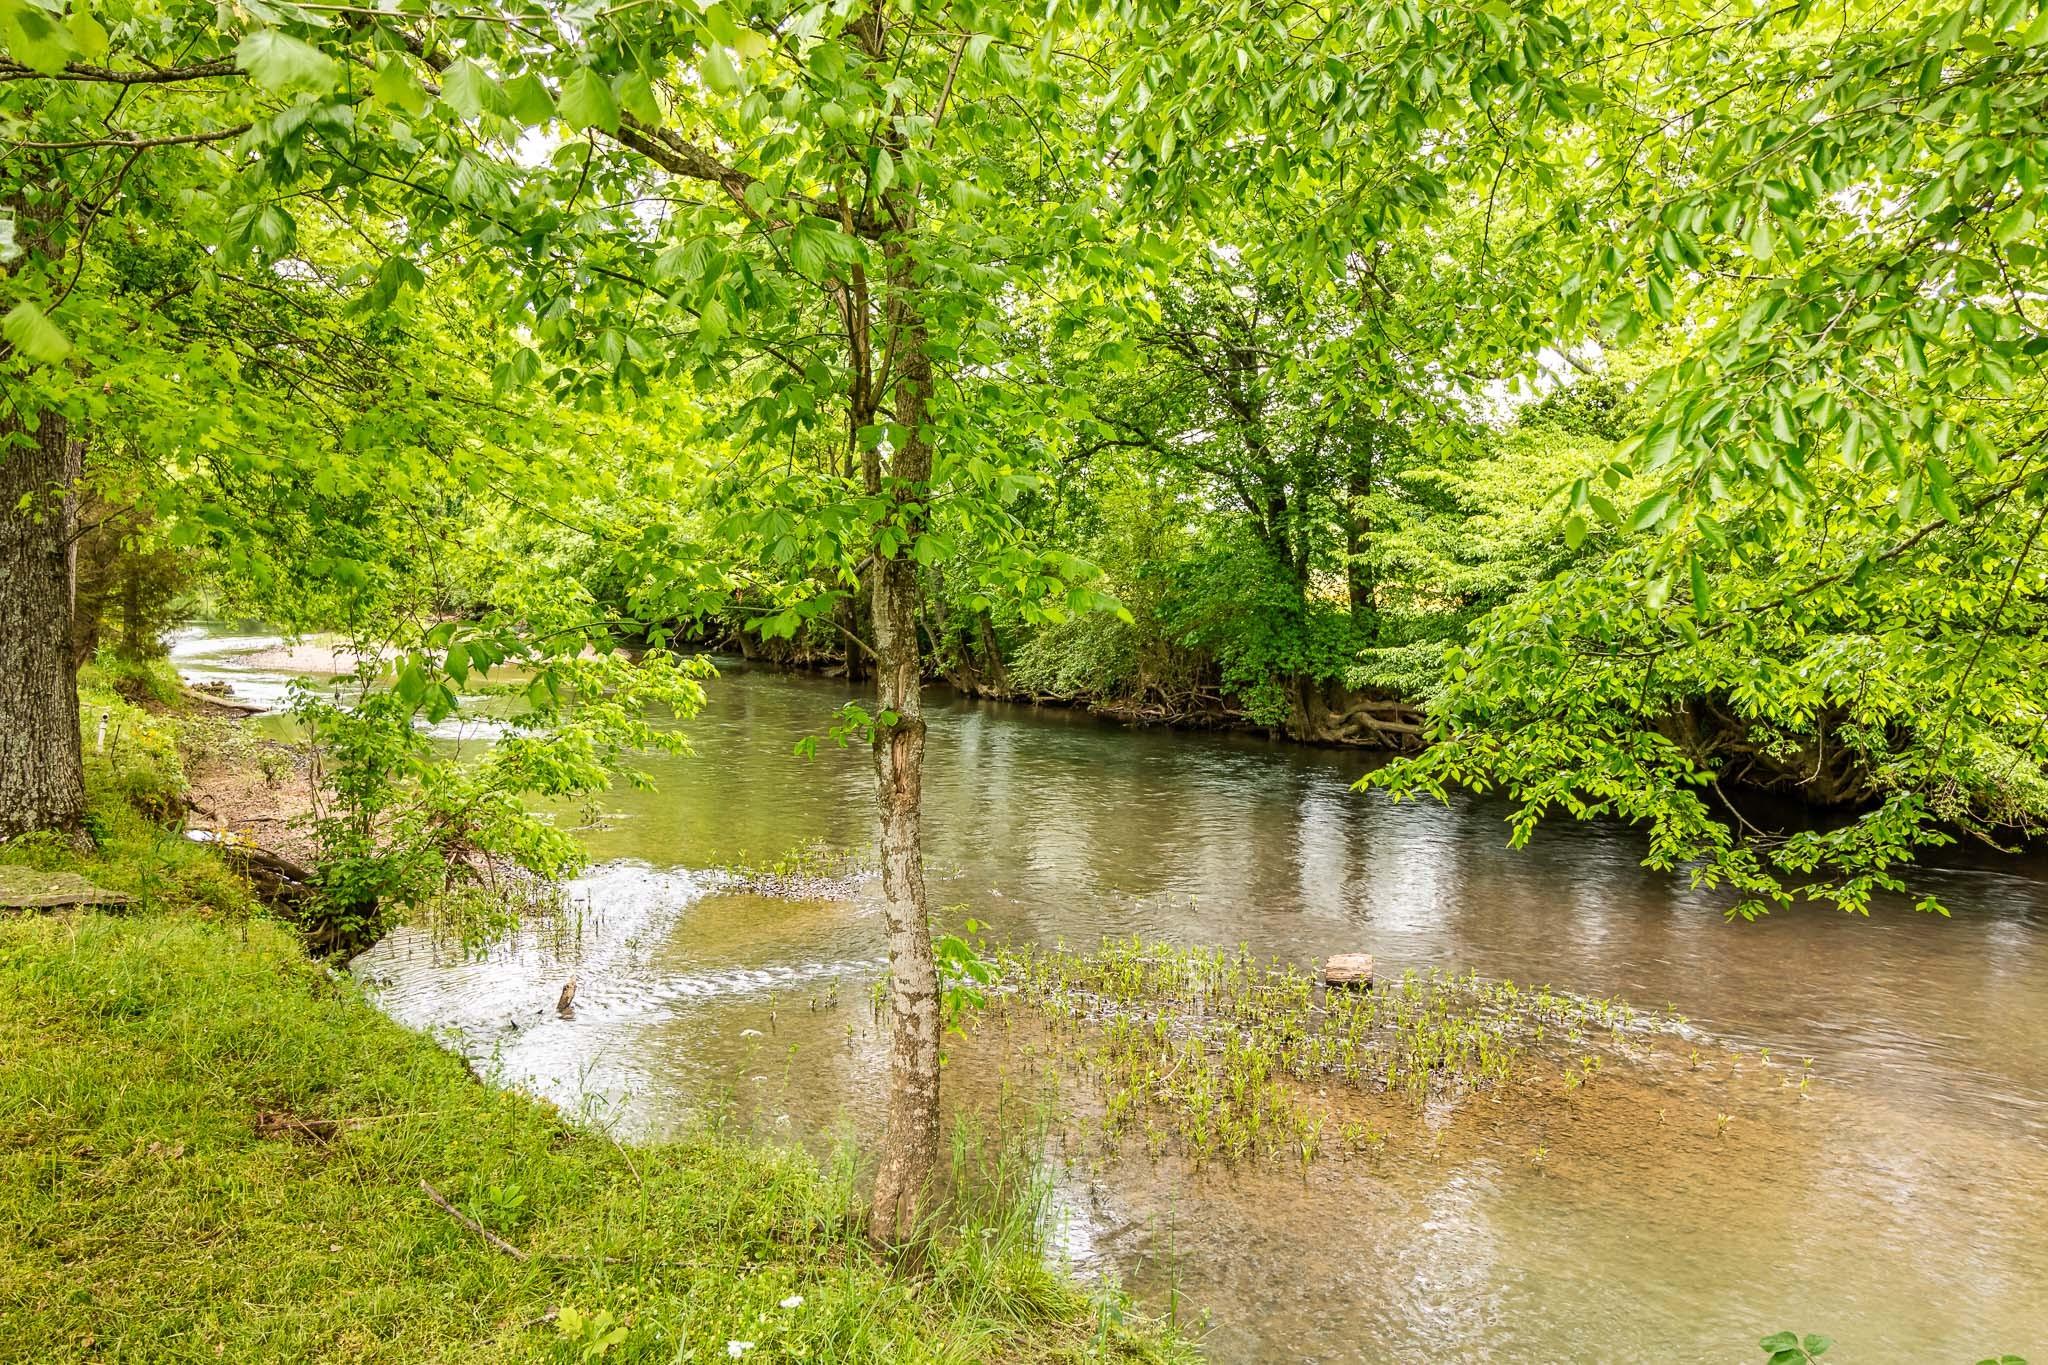 5940 Campbellsville Rd, Pulaski, TN 38478 - Pulaski, TN real estate listing